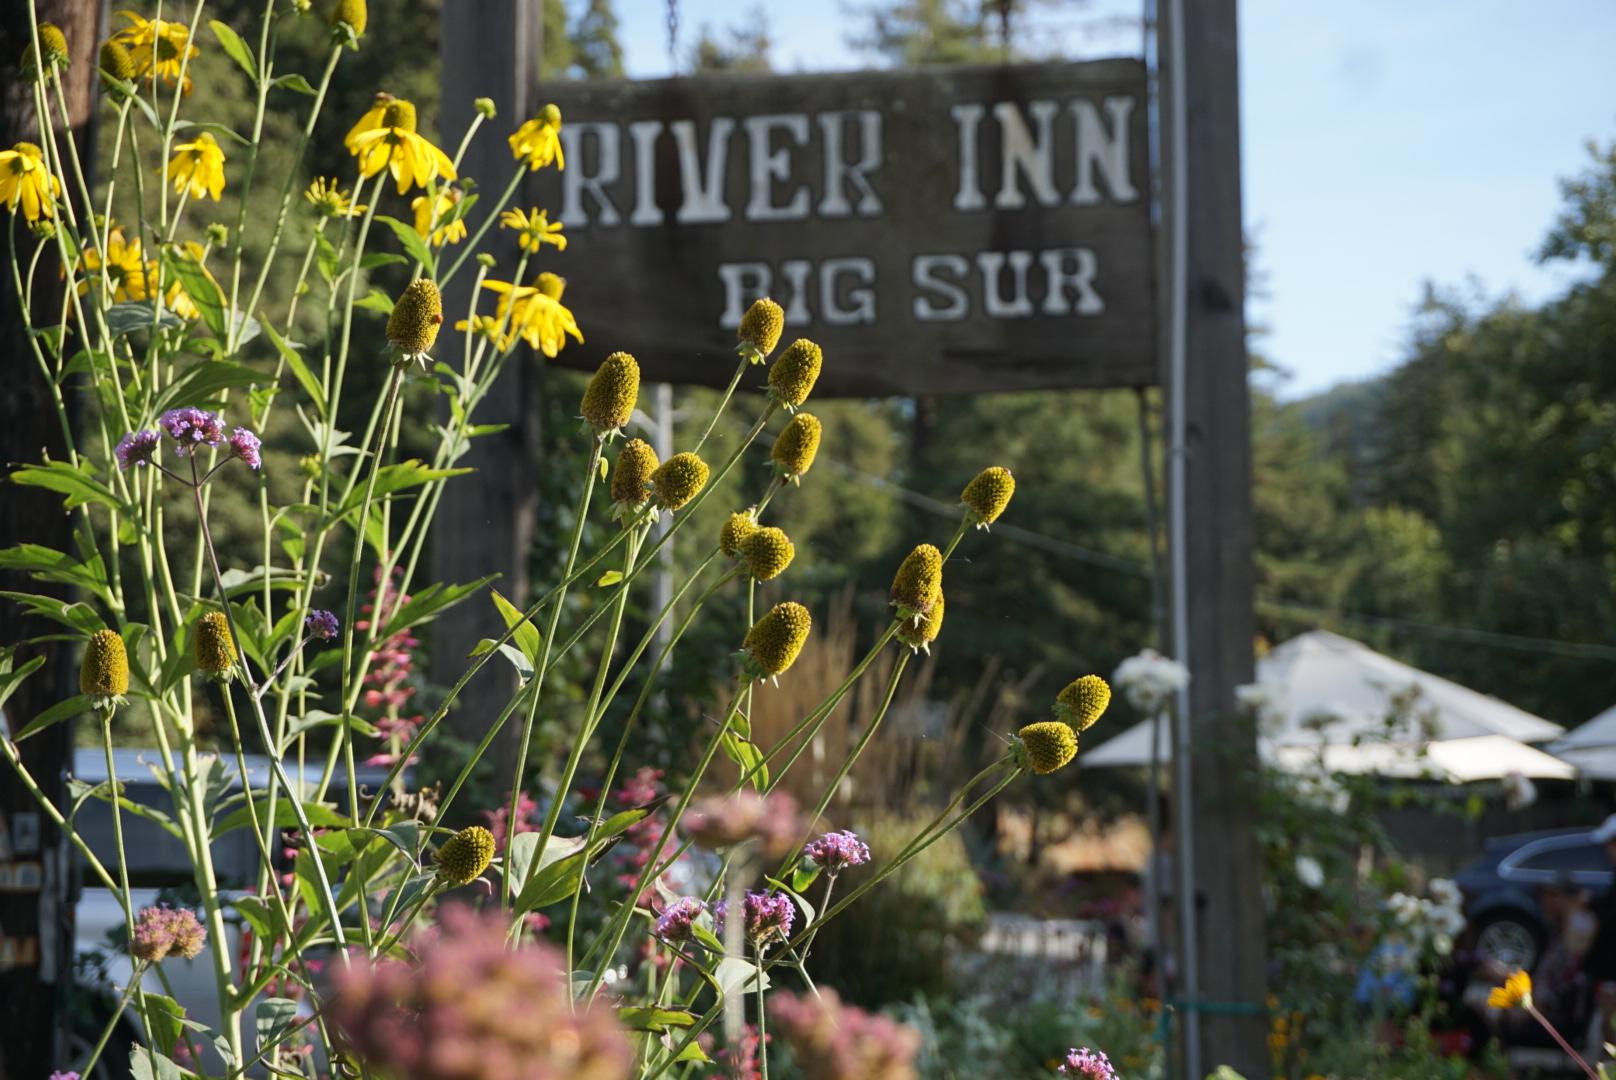 The gardens at River Inn were gorgeous.